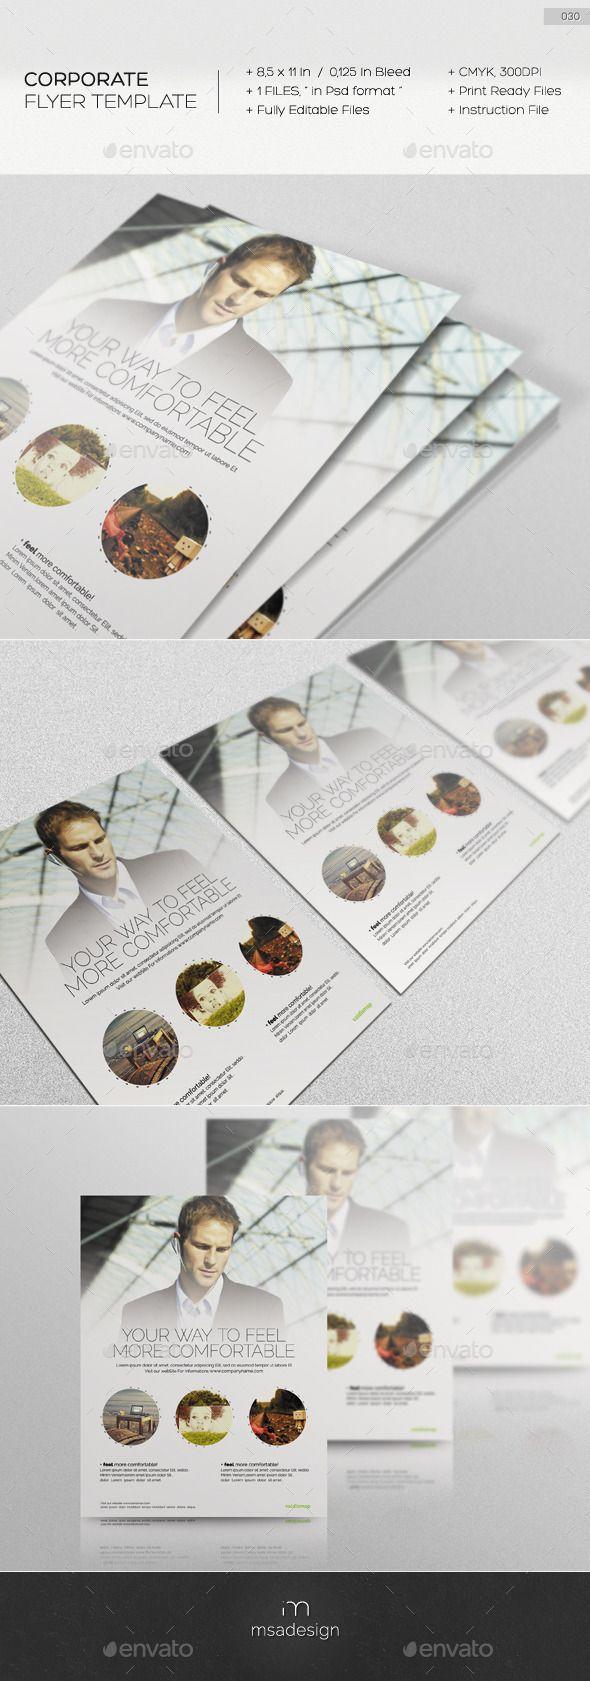 10 best political design images on pinterest advertising corporate flyer 030 magicingreecefo Images